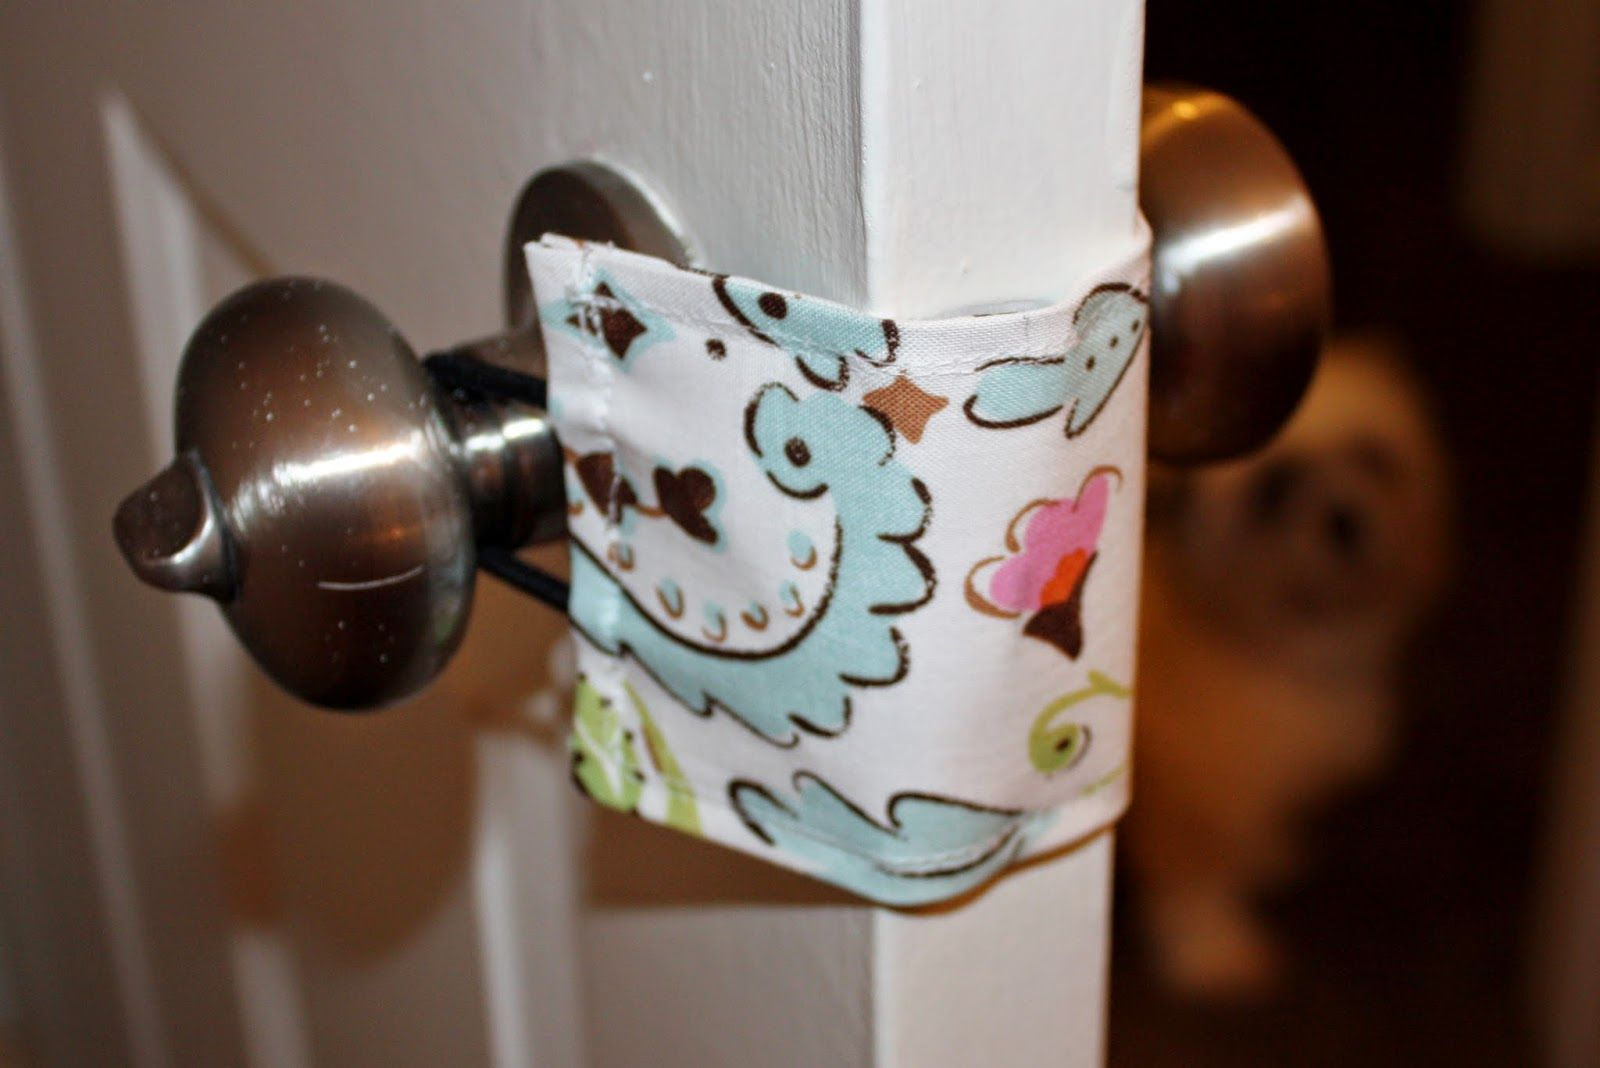 Girl Nursery. Door Stopper. The Potter U0026 His Clay: Our Girlu0027s Nursery